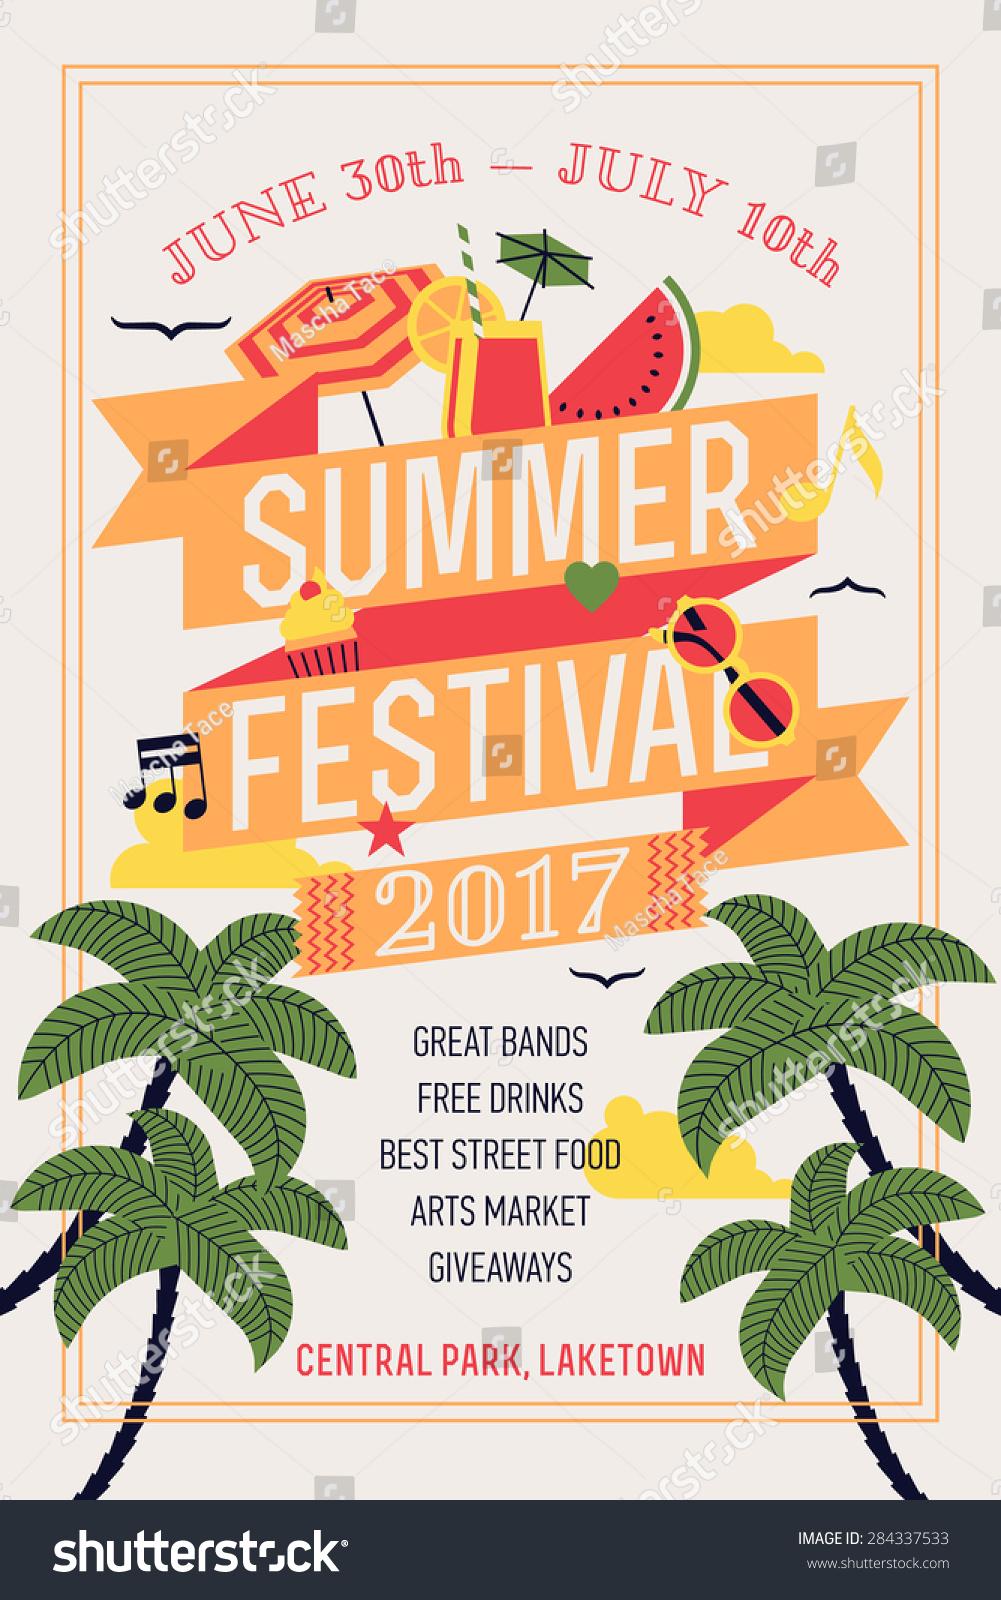 Beautiful Summer Festival Web Banner Printable Stock Vector ...